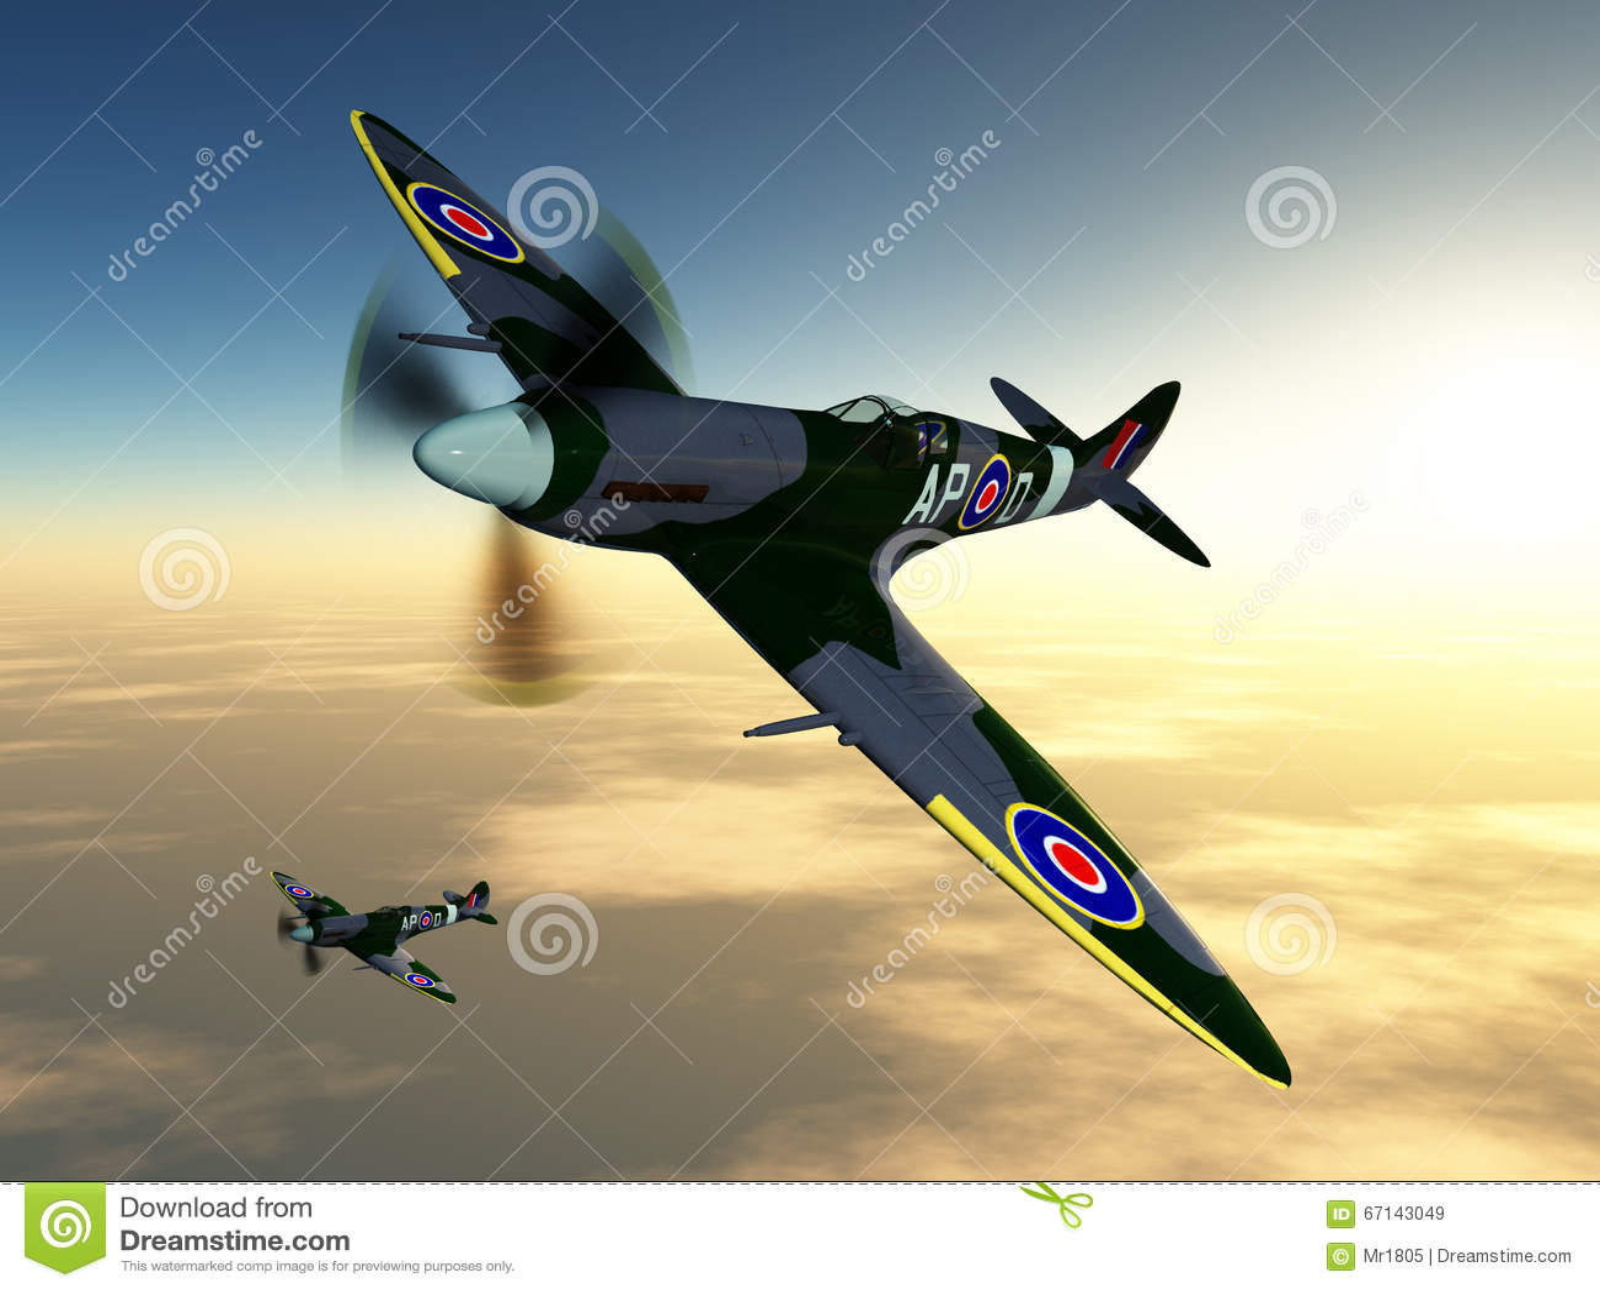 Aerei Da Caccia Inglesi Seconda Guerra Mondiale : Aerei da caccia britannici della seconda guerra mondiale